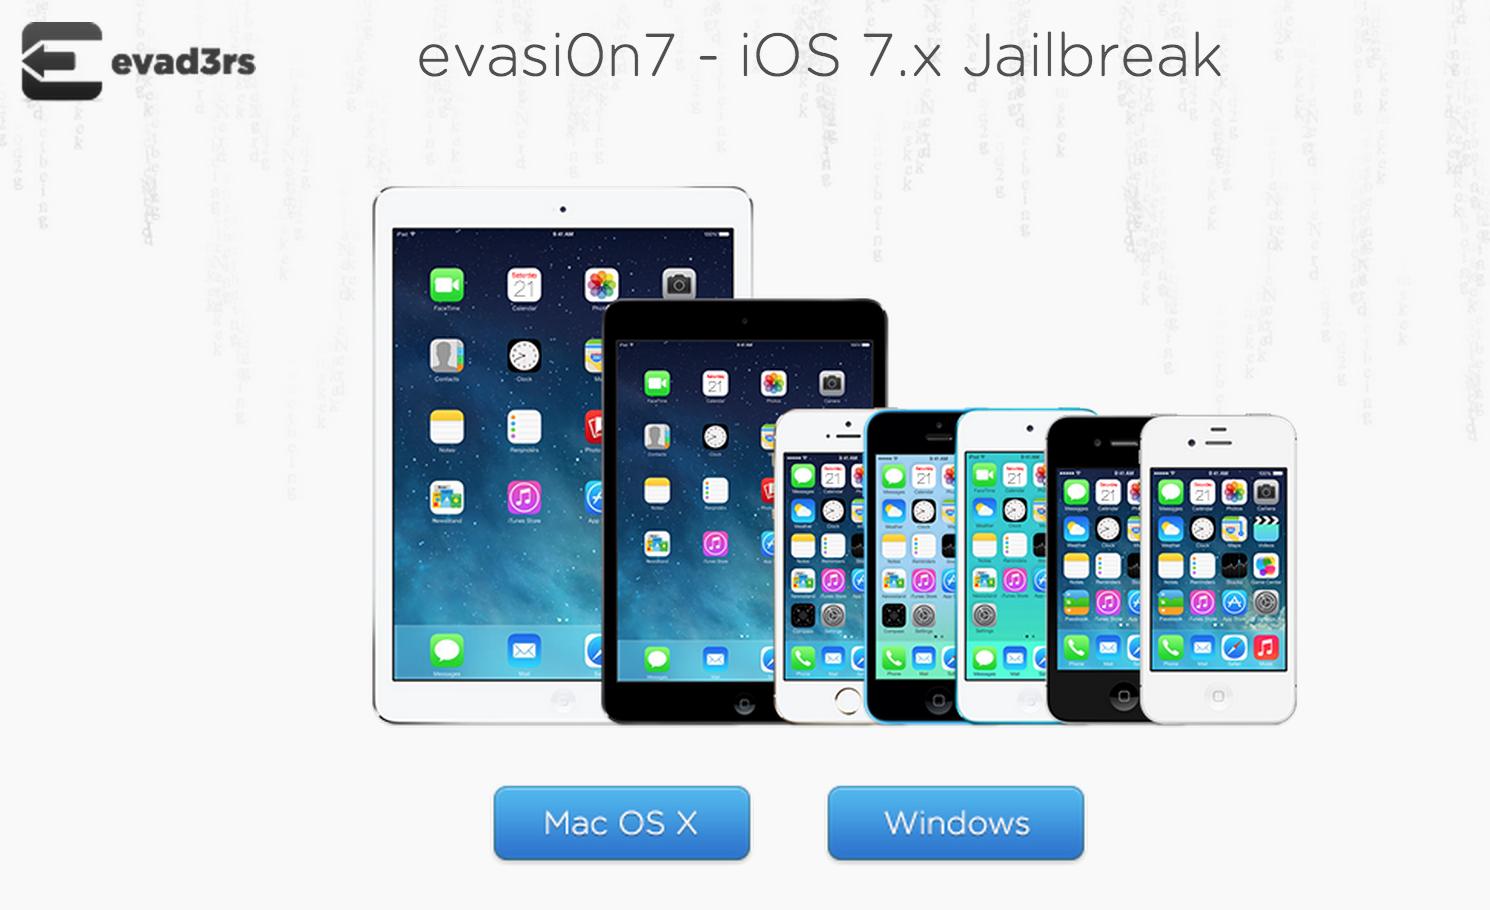 How to jailbreak iOS 7 using evasi0n7 [Windows tutorial]